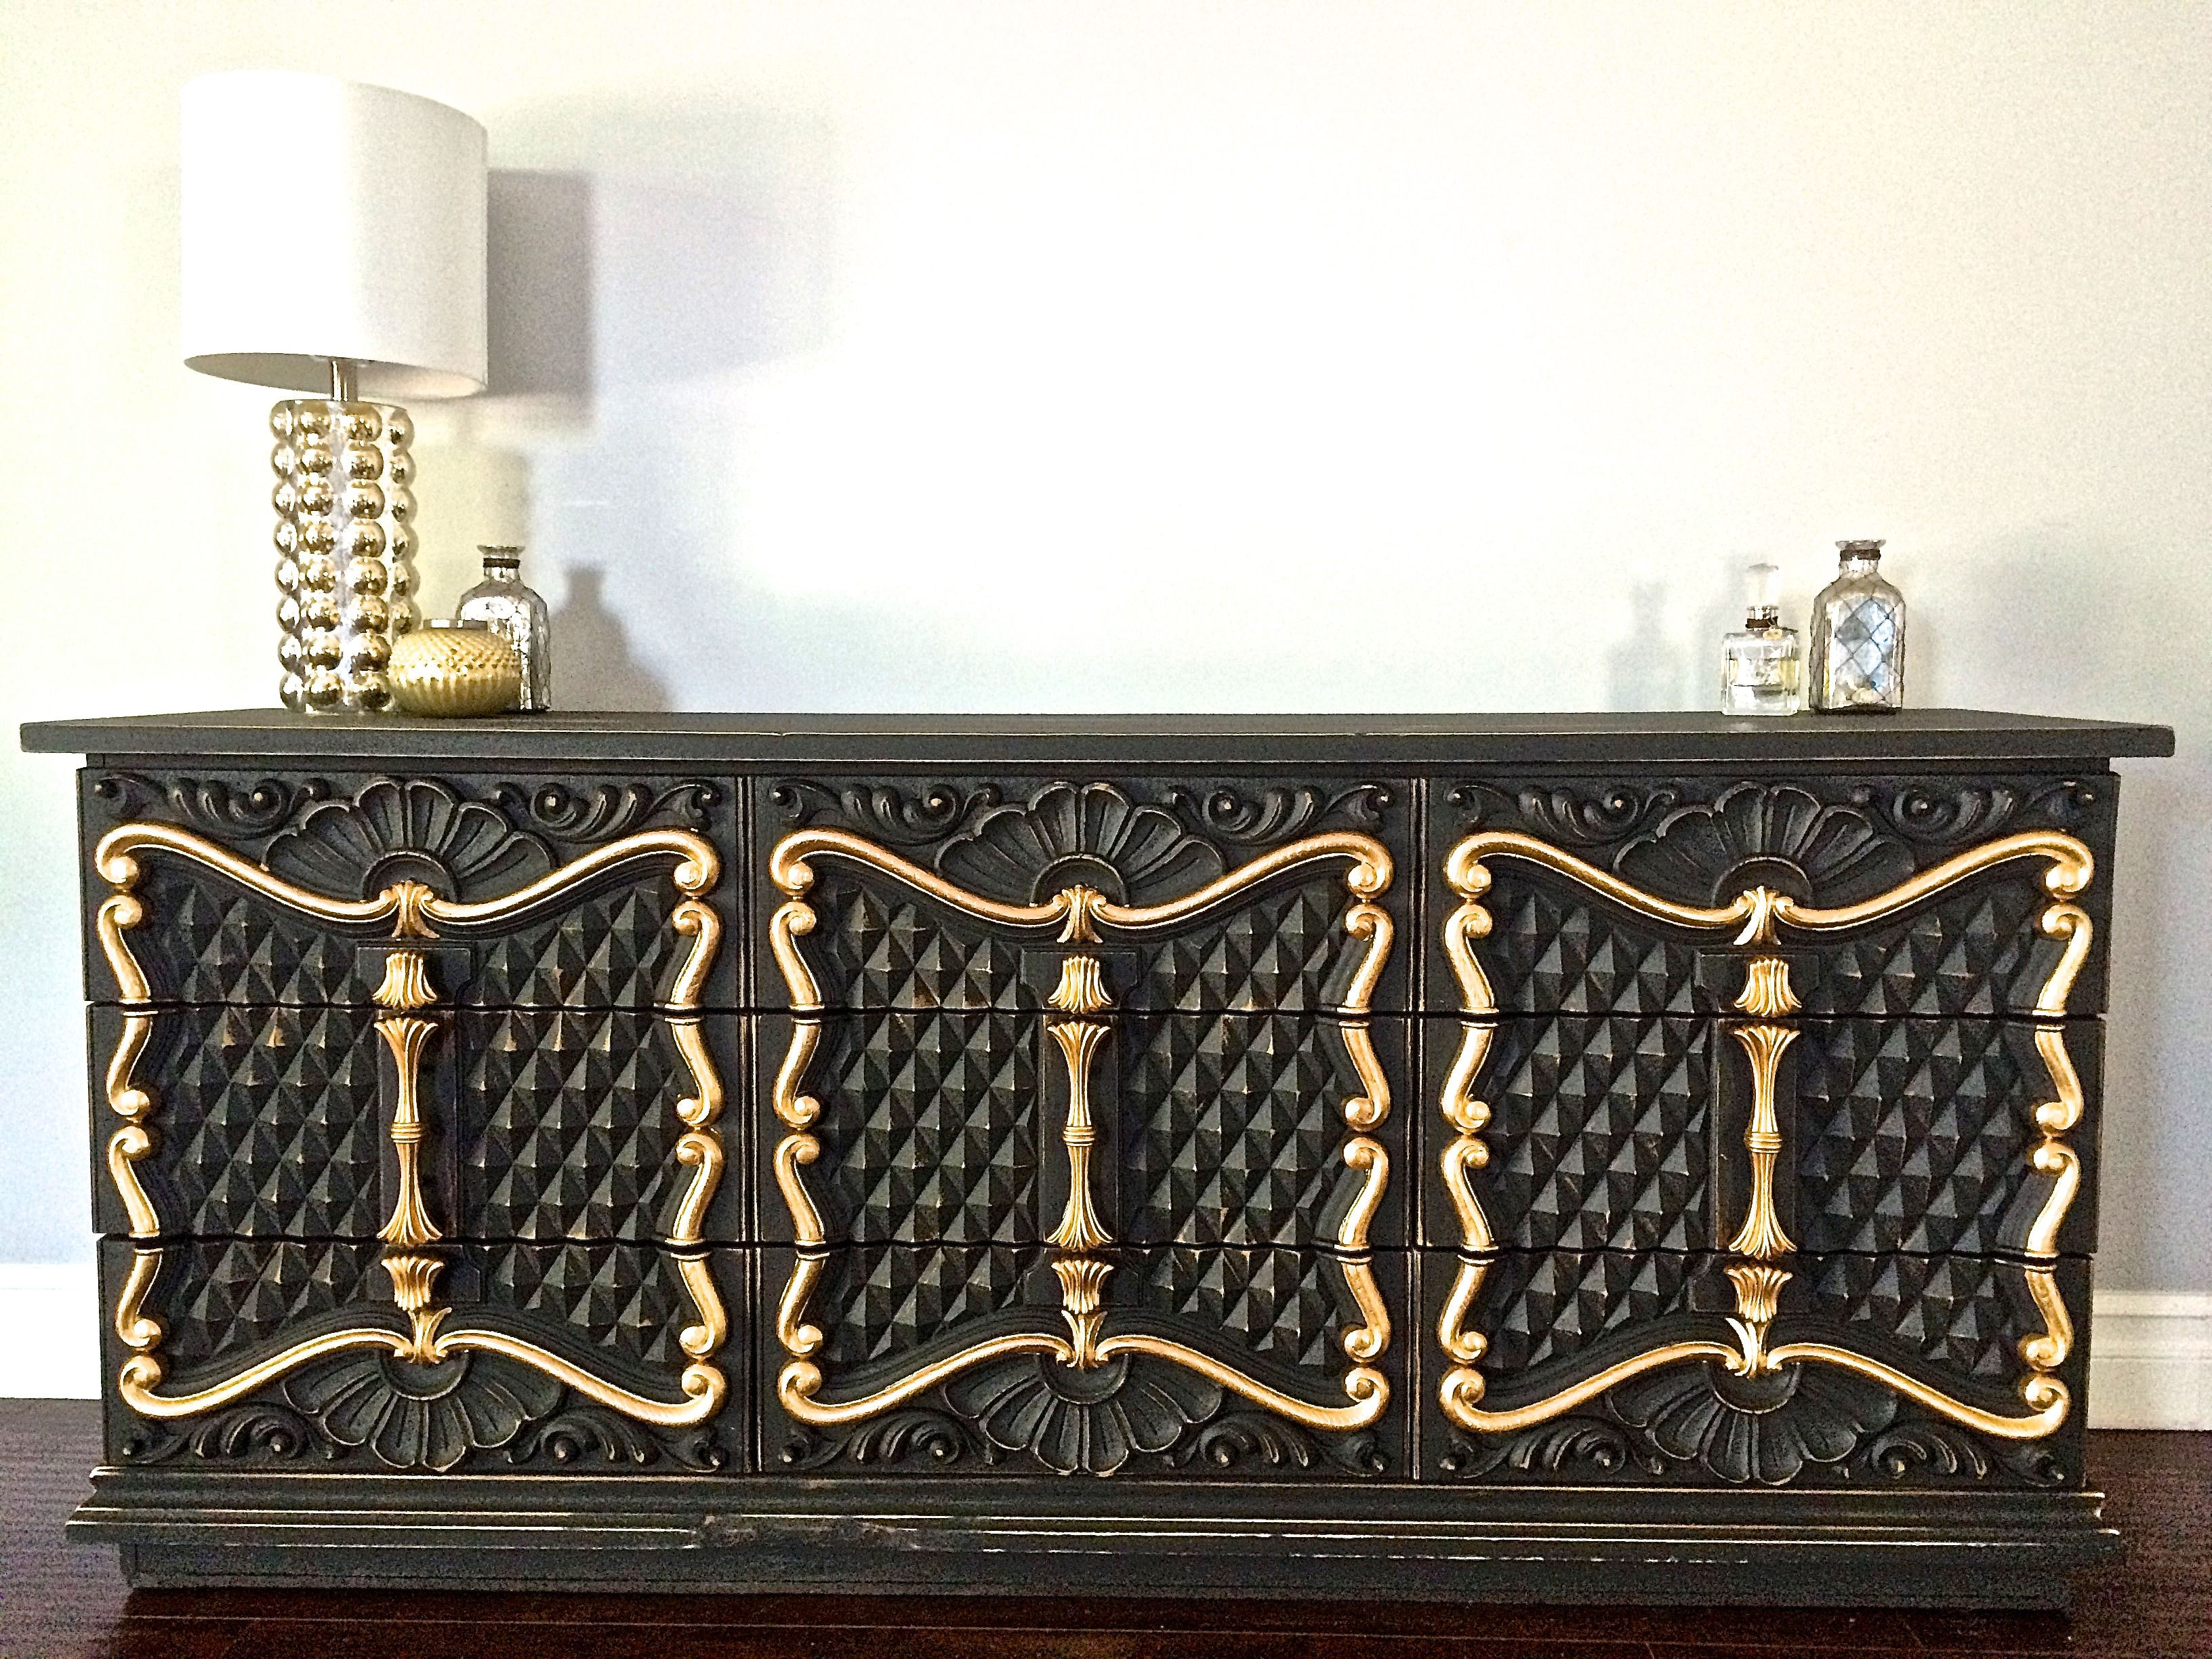 Black shabby chic furniture - Shabby Chic Black Gold Leaf 9 Drawer Dresser 350 Sold